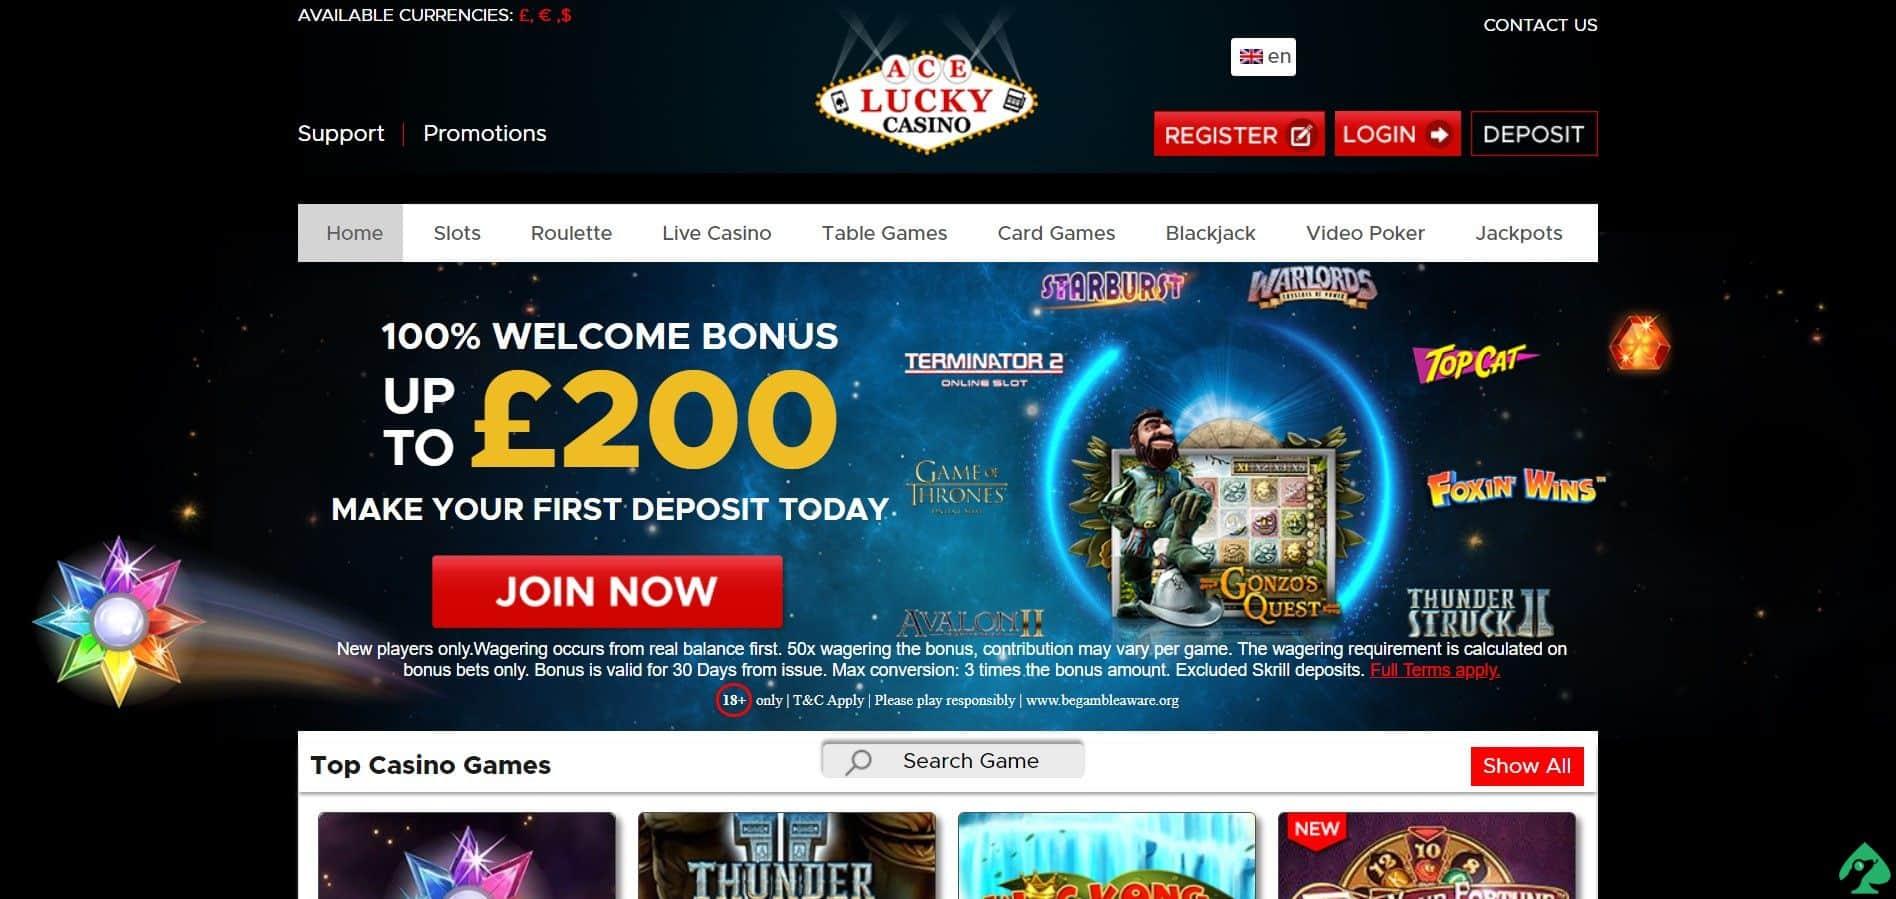 aceluckycasino.com bonus codes